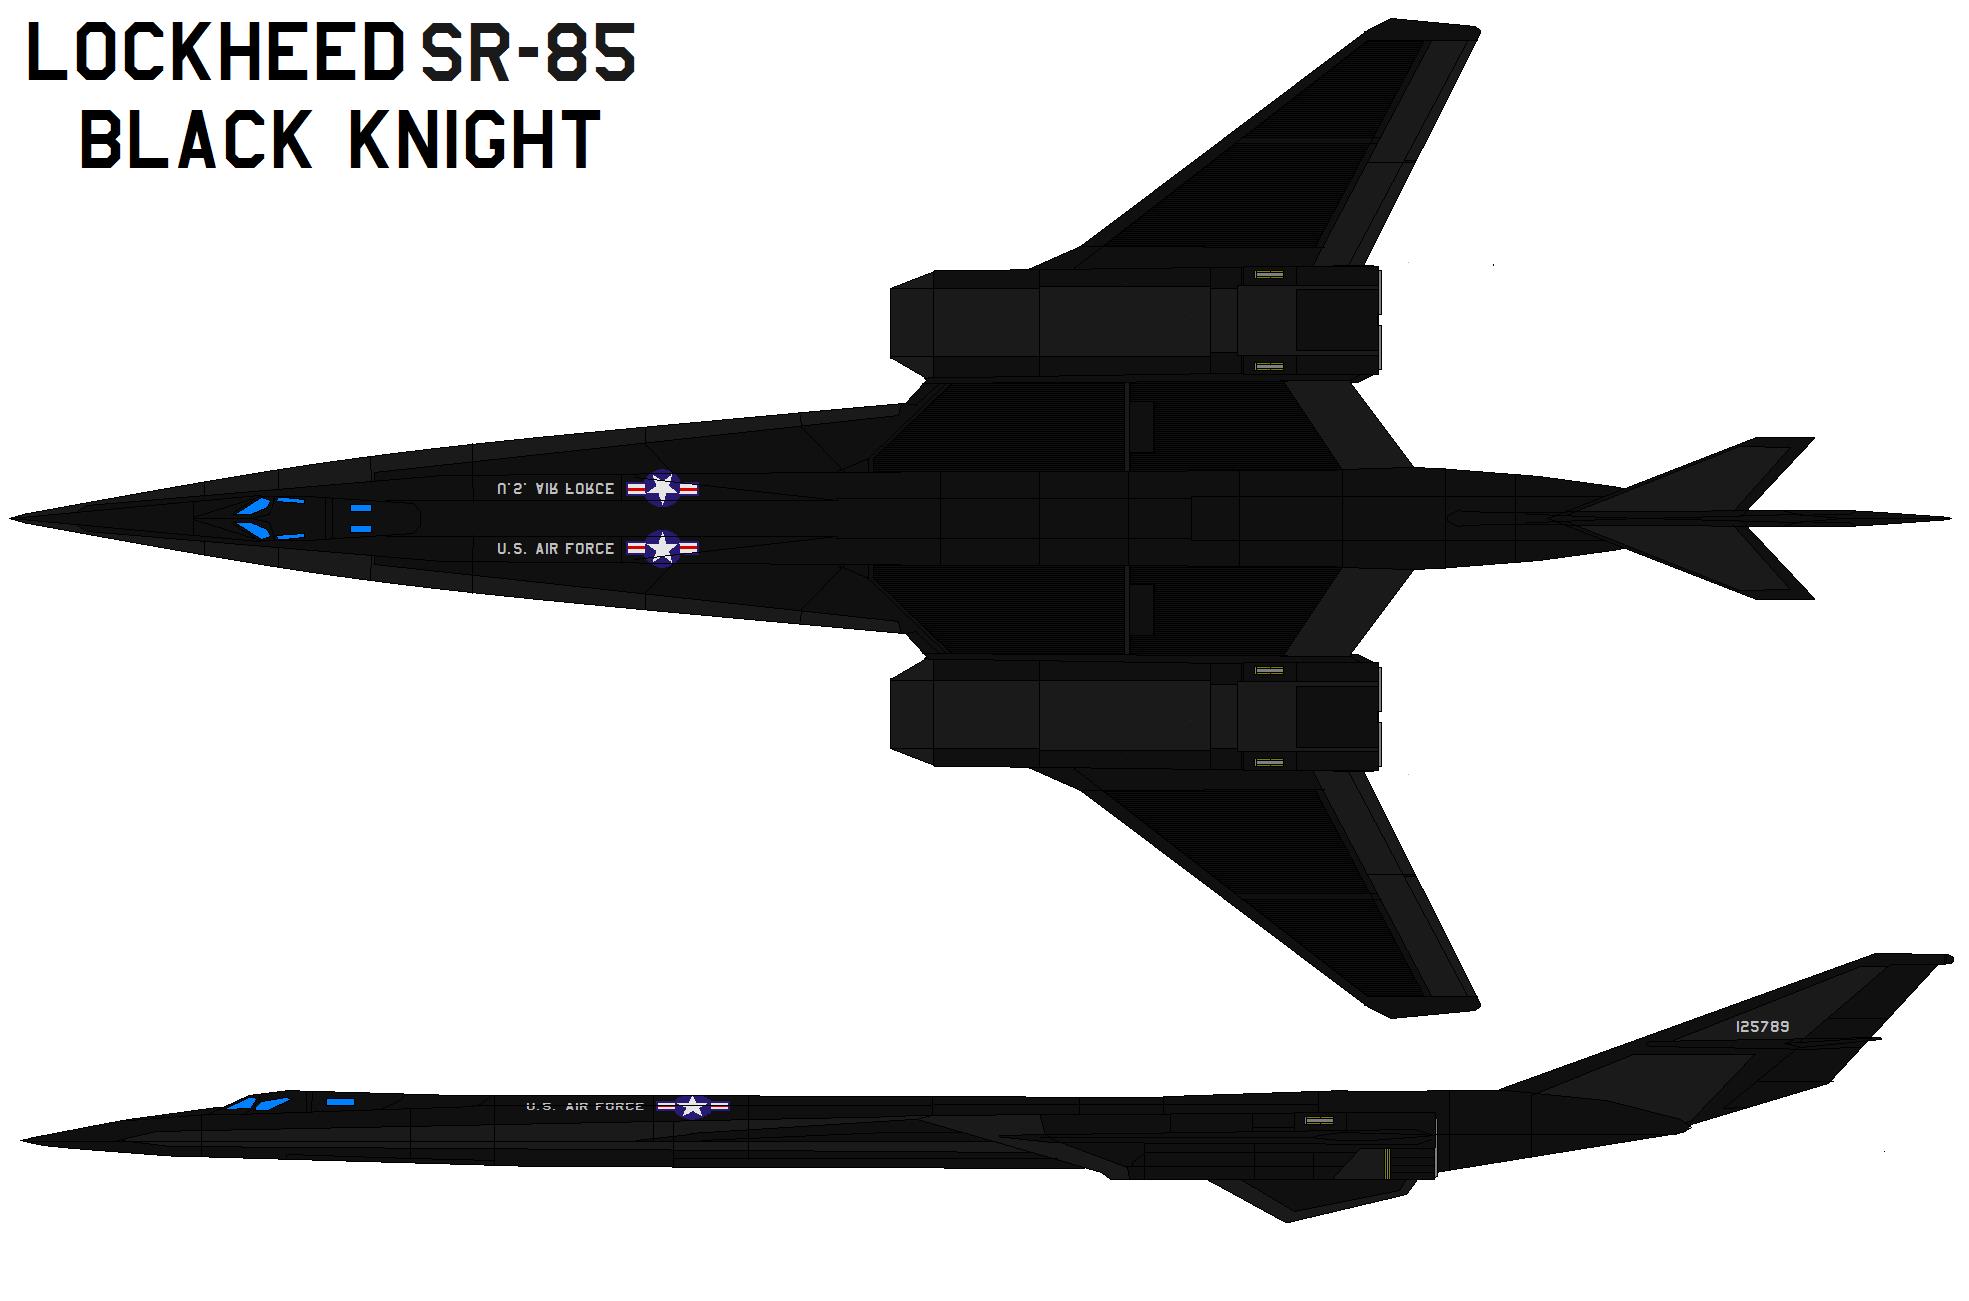 Mach 25 Speed In Mph Lockheed Sr Black Knight By Bagera Djyf